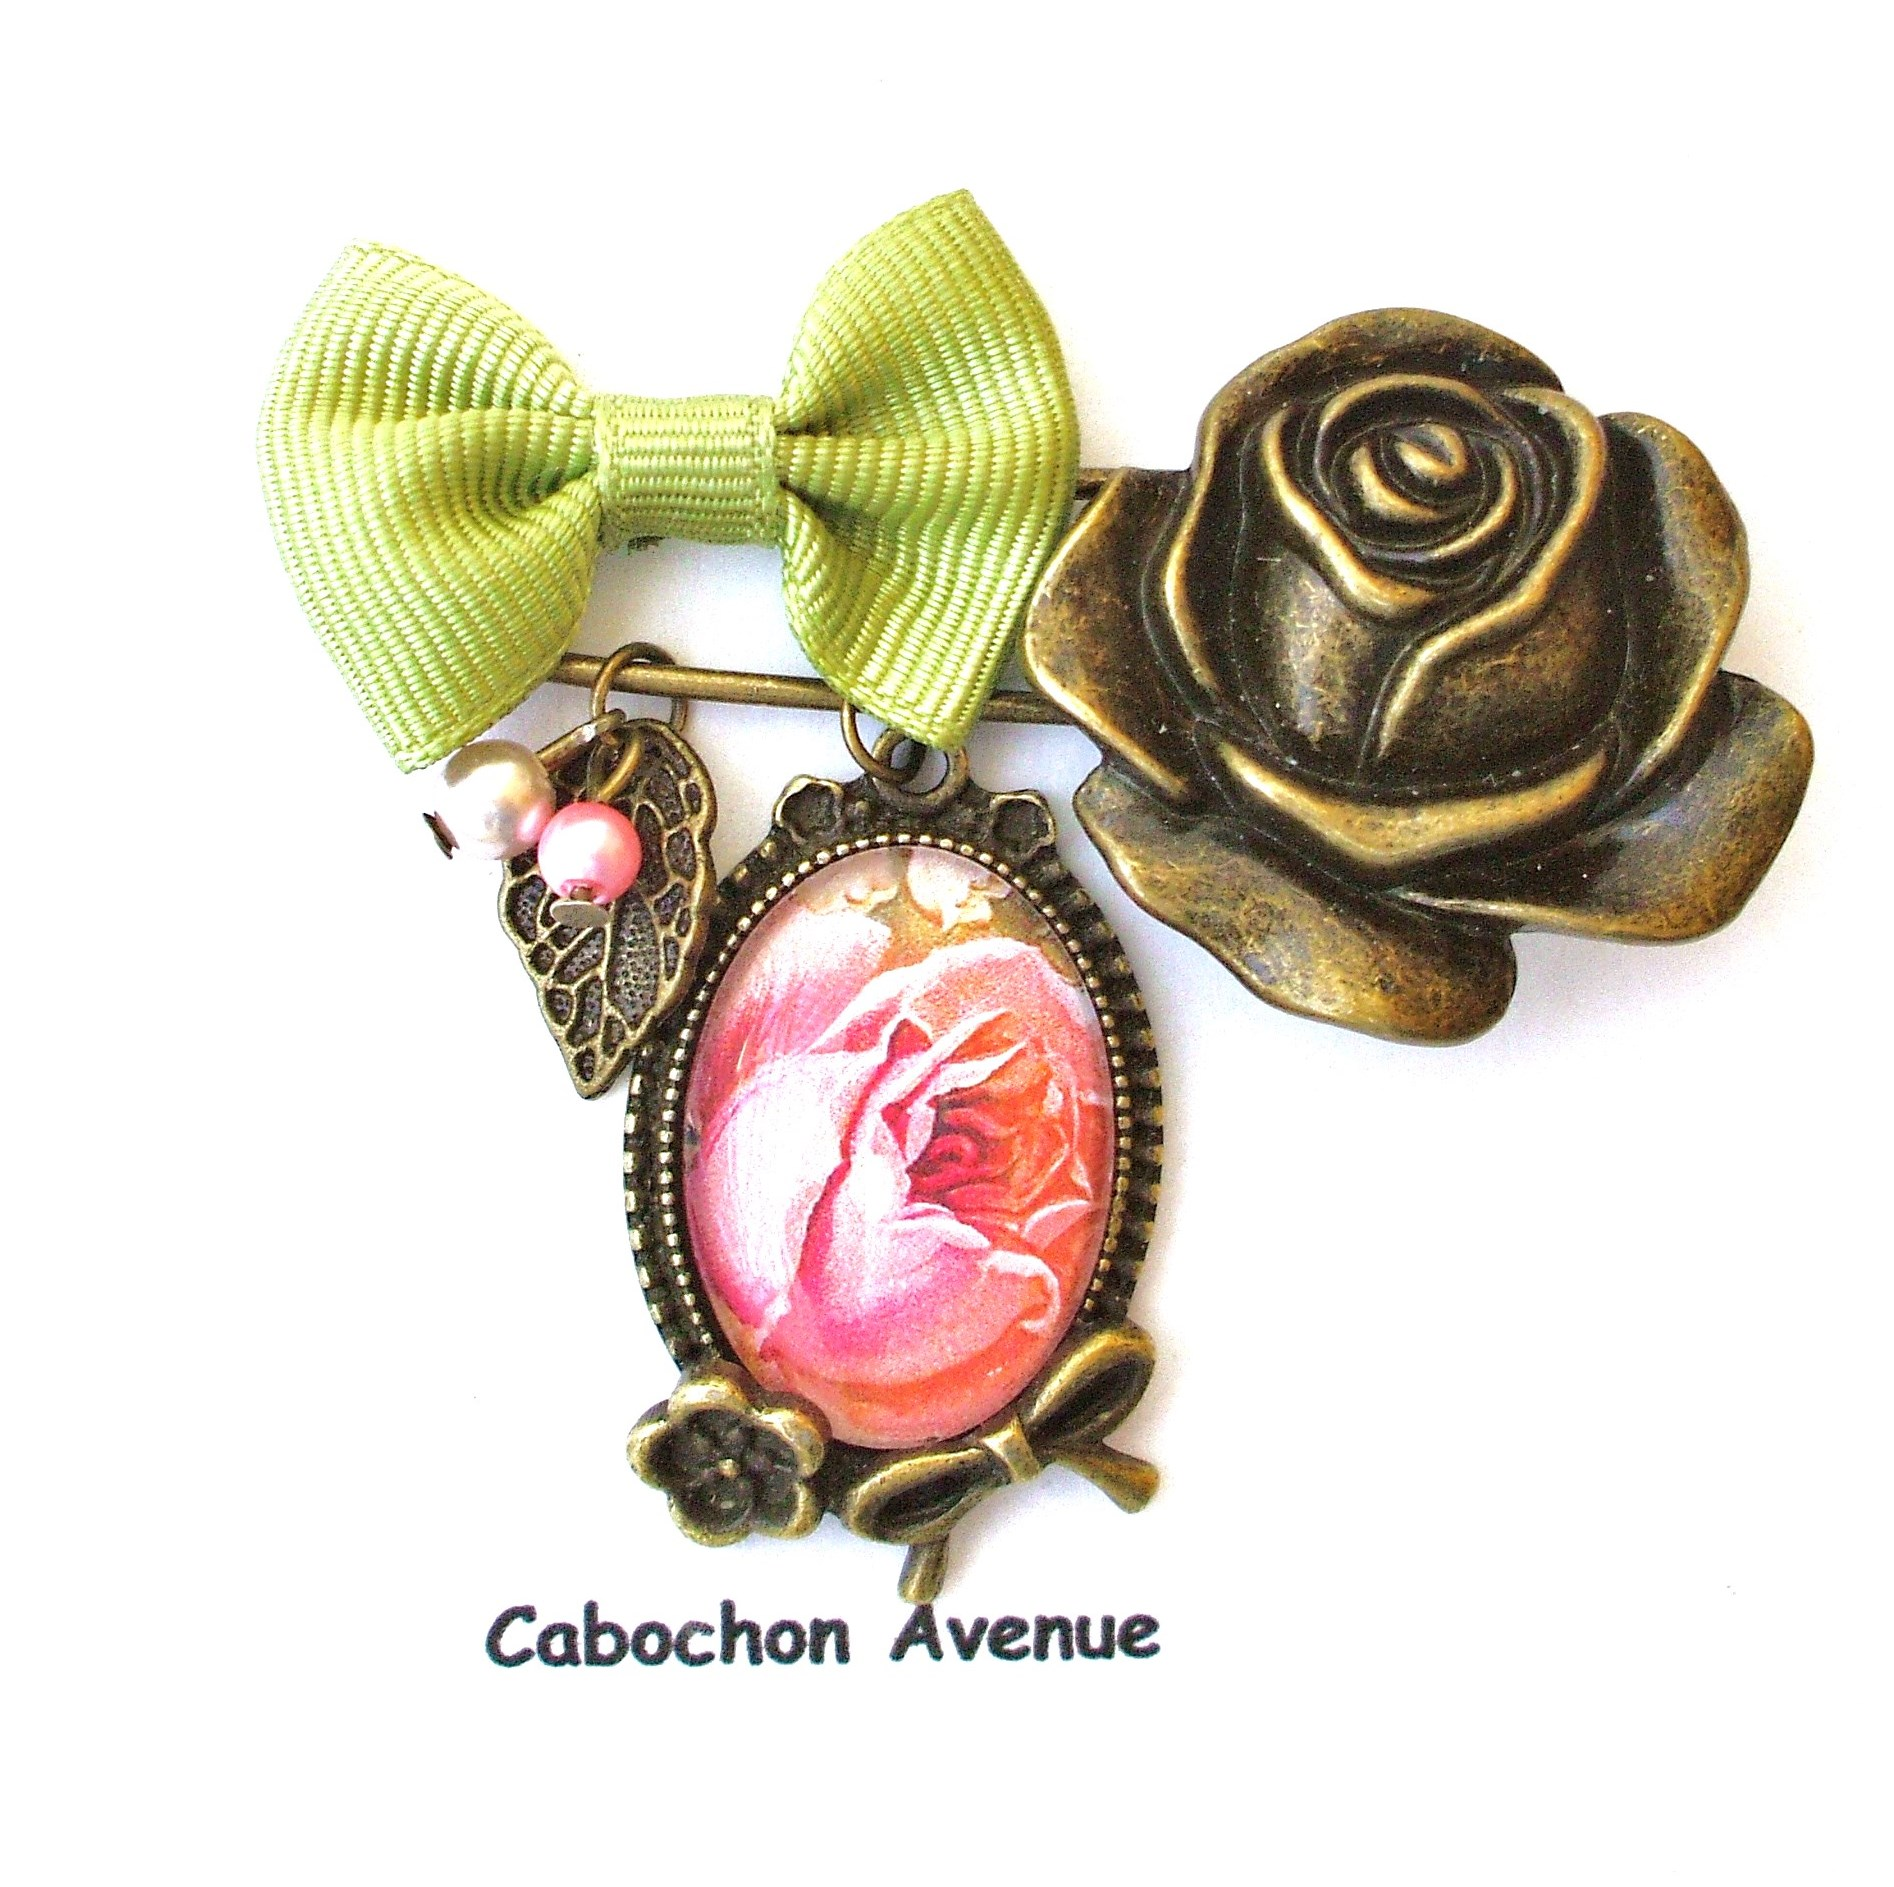 bijou fleur rose collier pendentif bijou fantaisie bronze cabochon verre fleur rose shabby. Black Bedroom Furniture Sets. Home Design Ideas